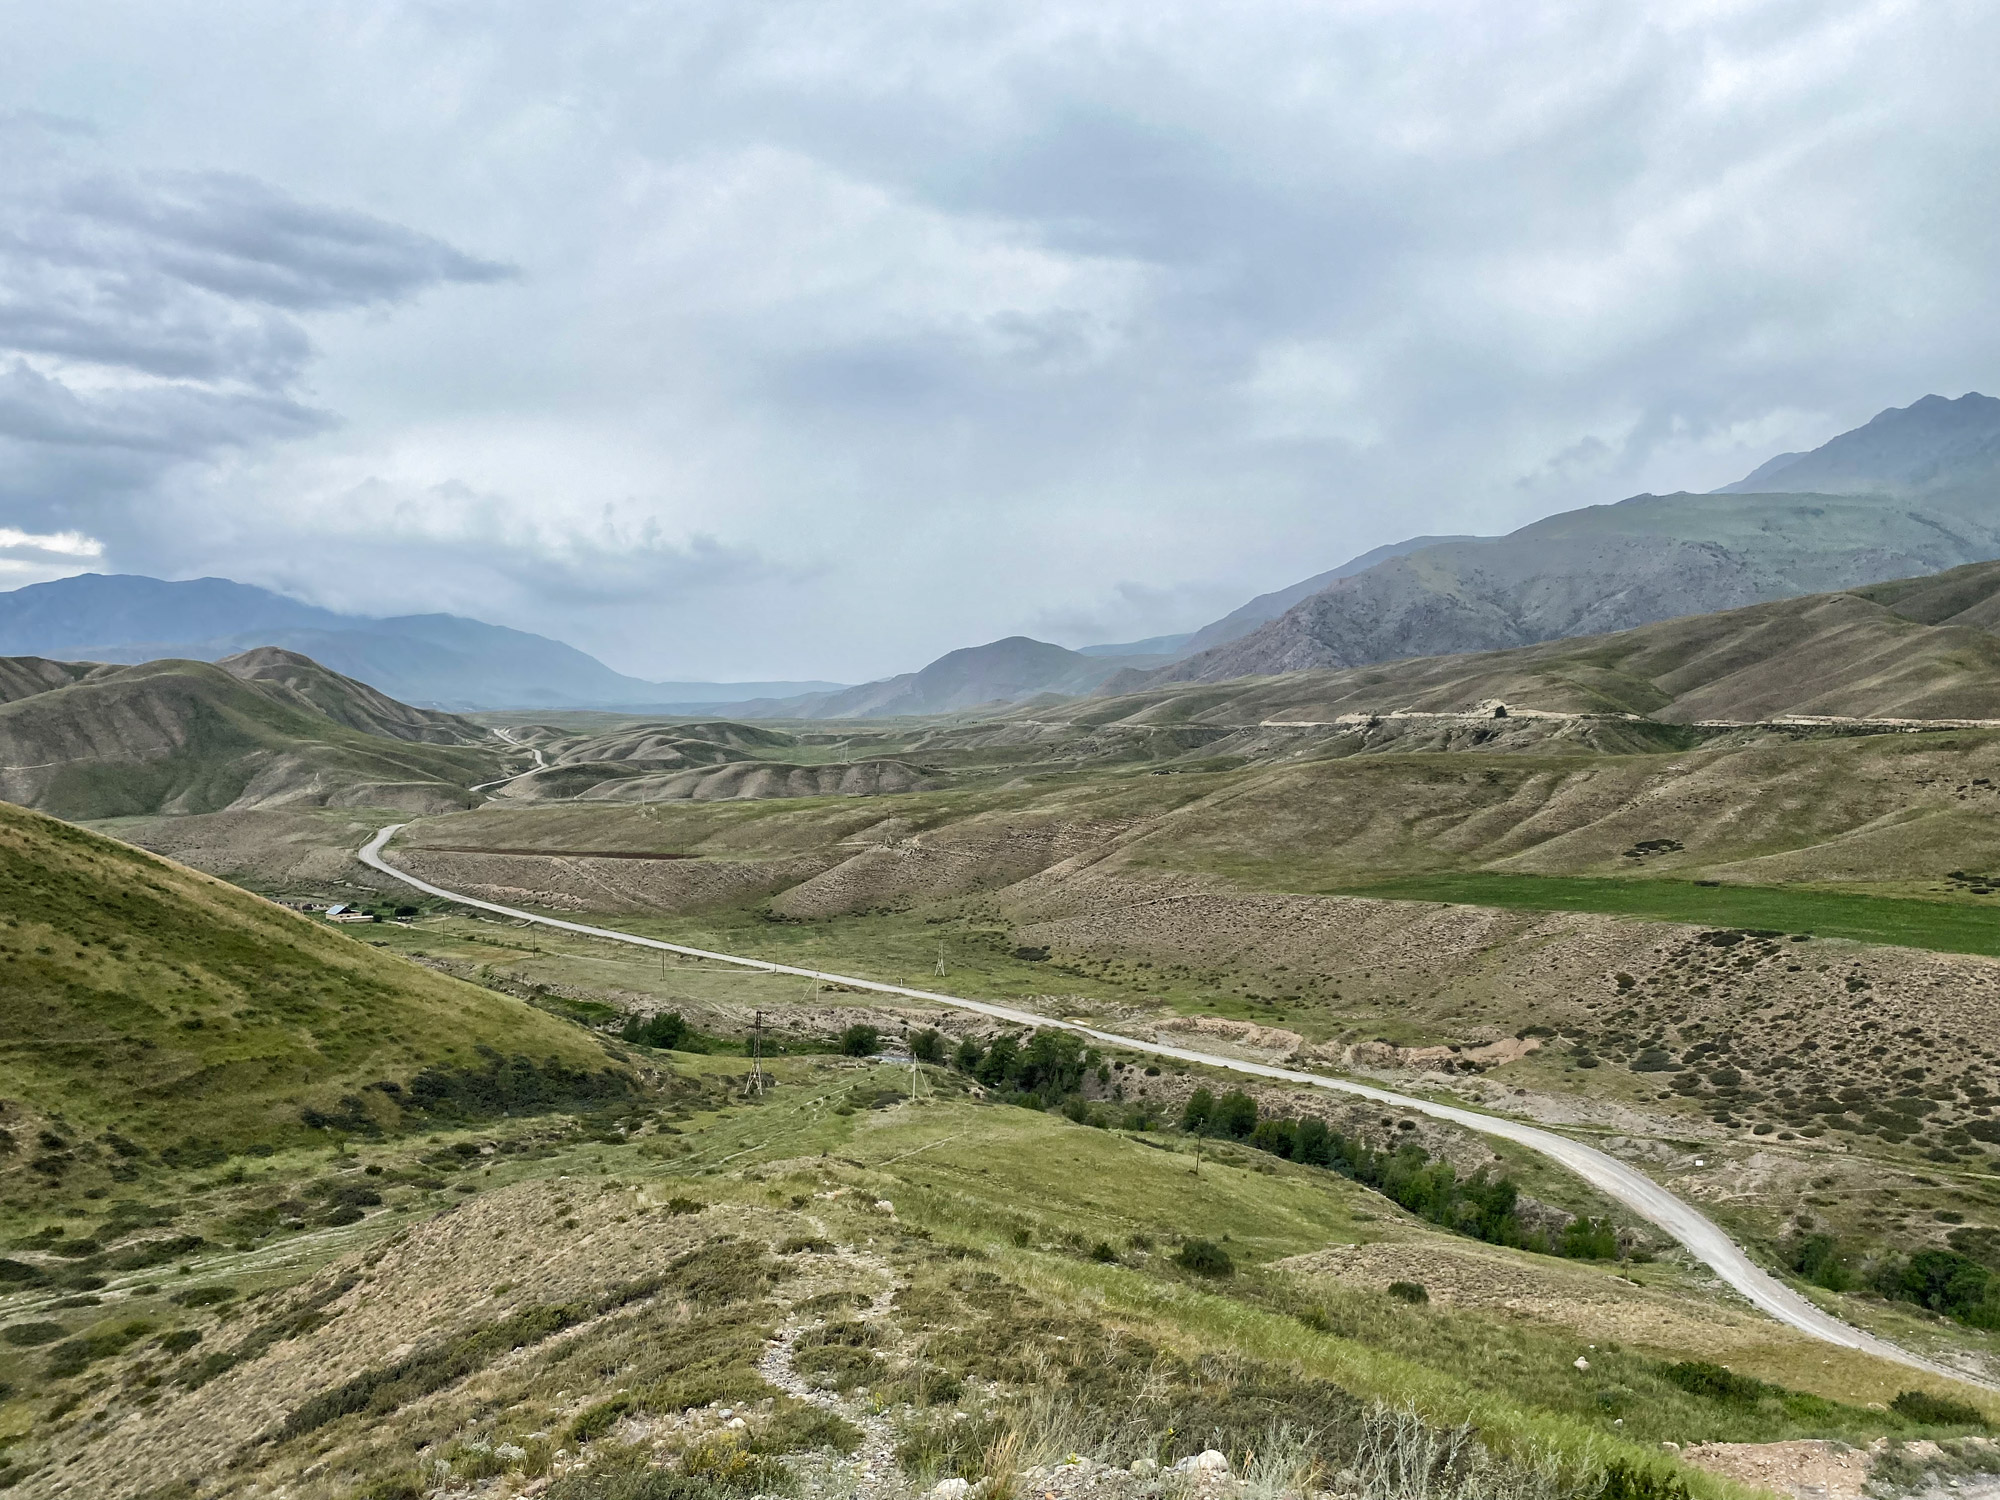 Reisroute Kirgizië - Naar Song Kul